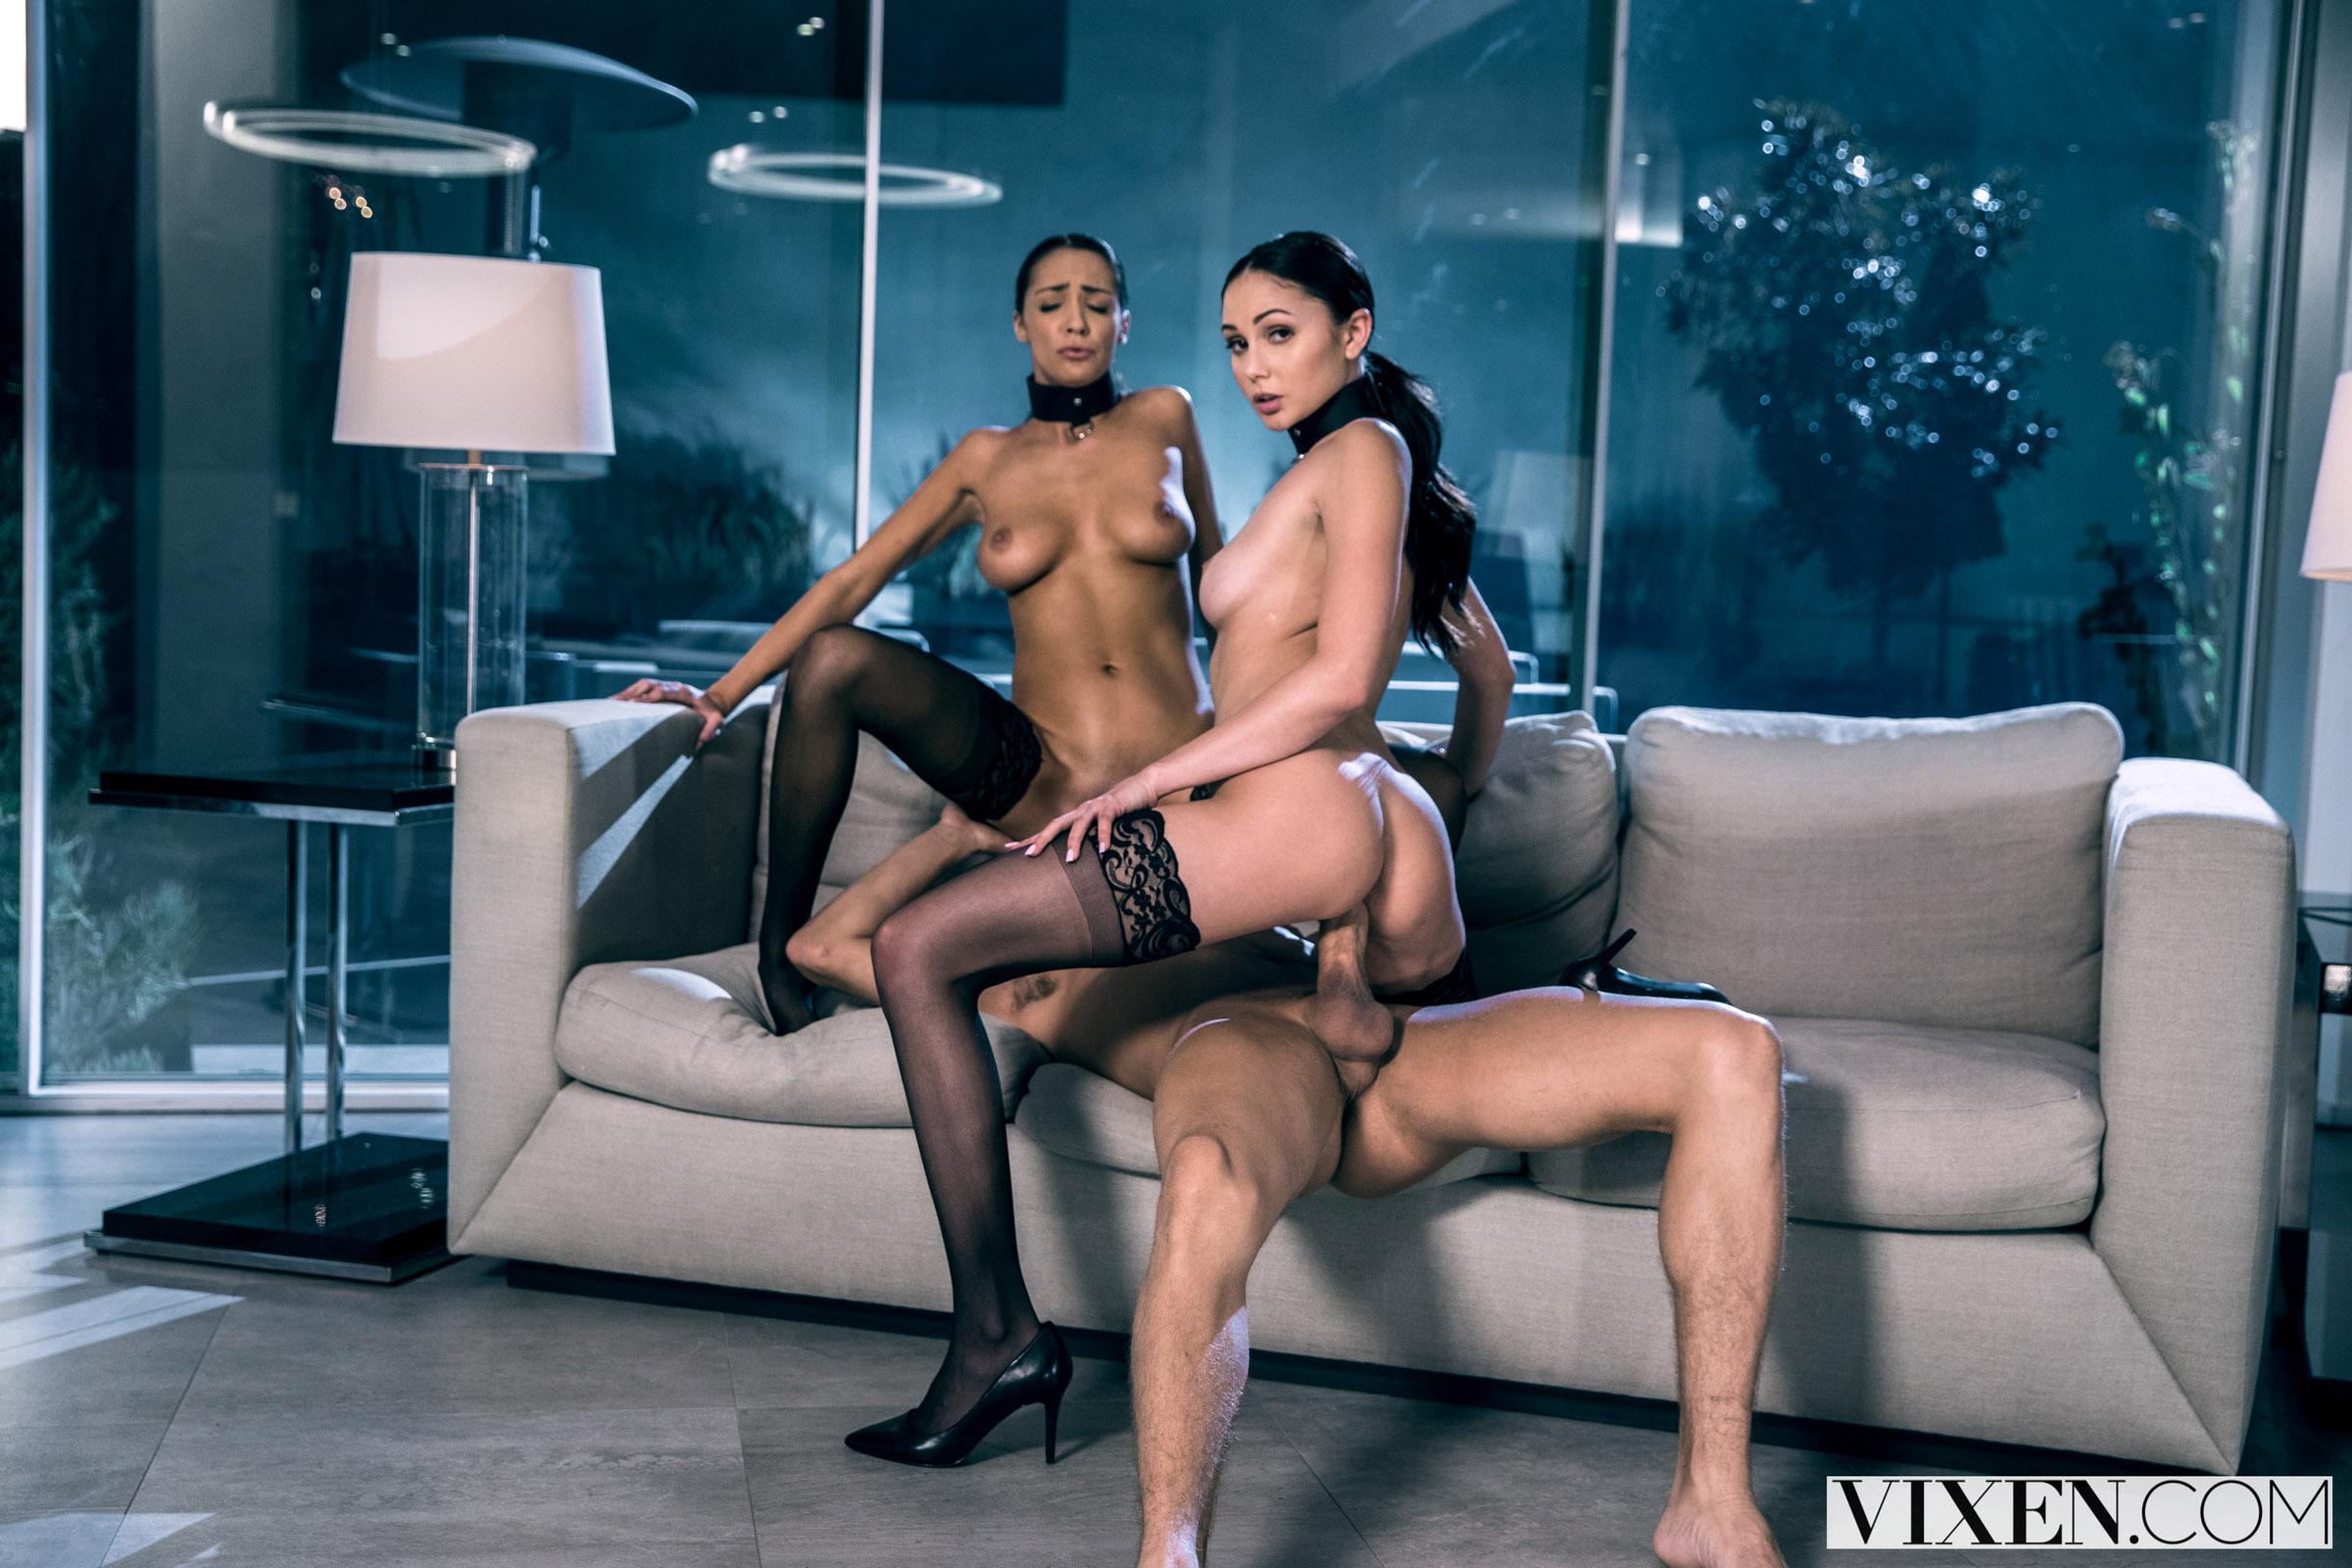 homo porno klube escort ilskov